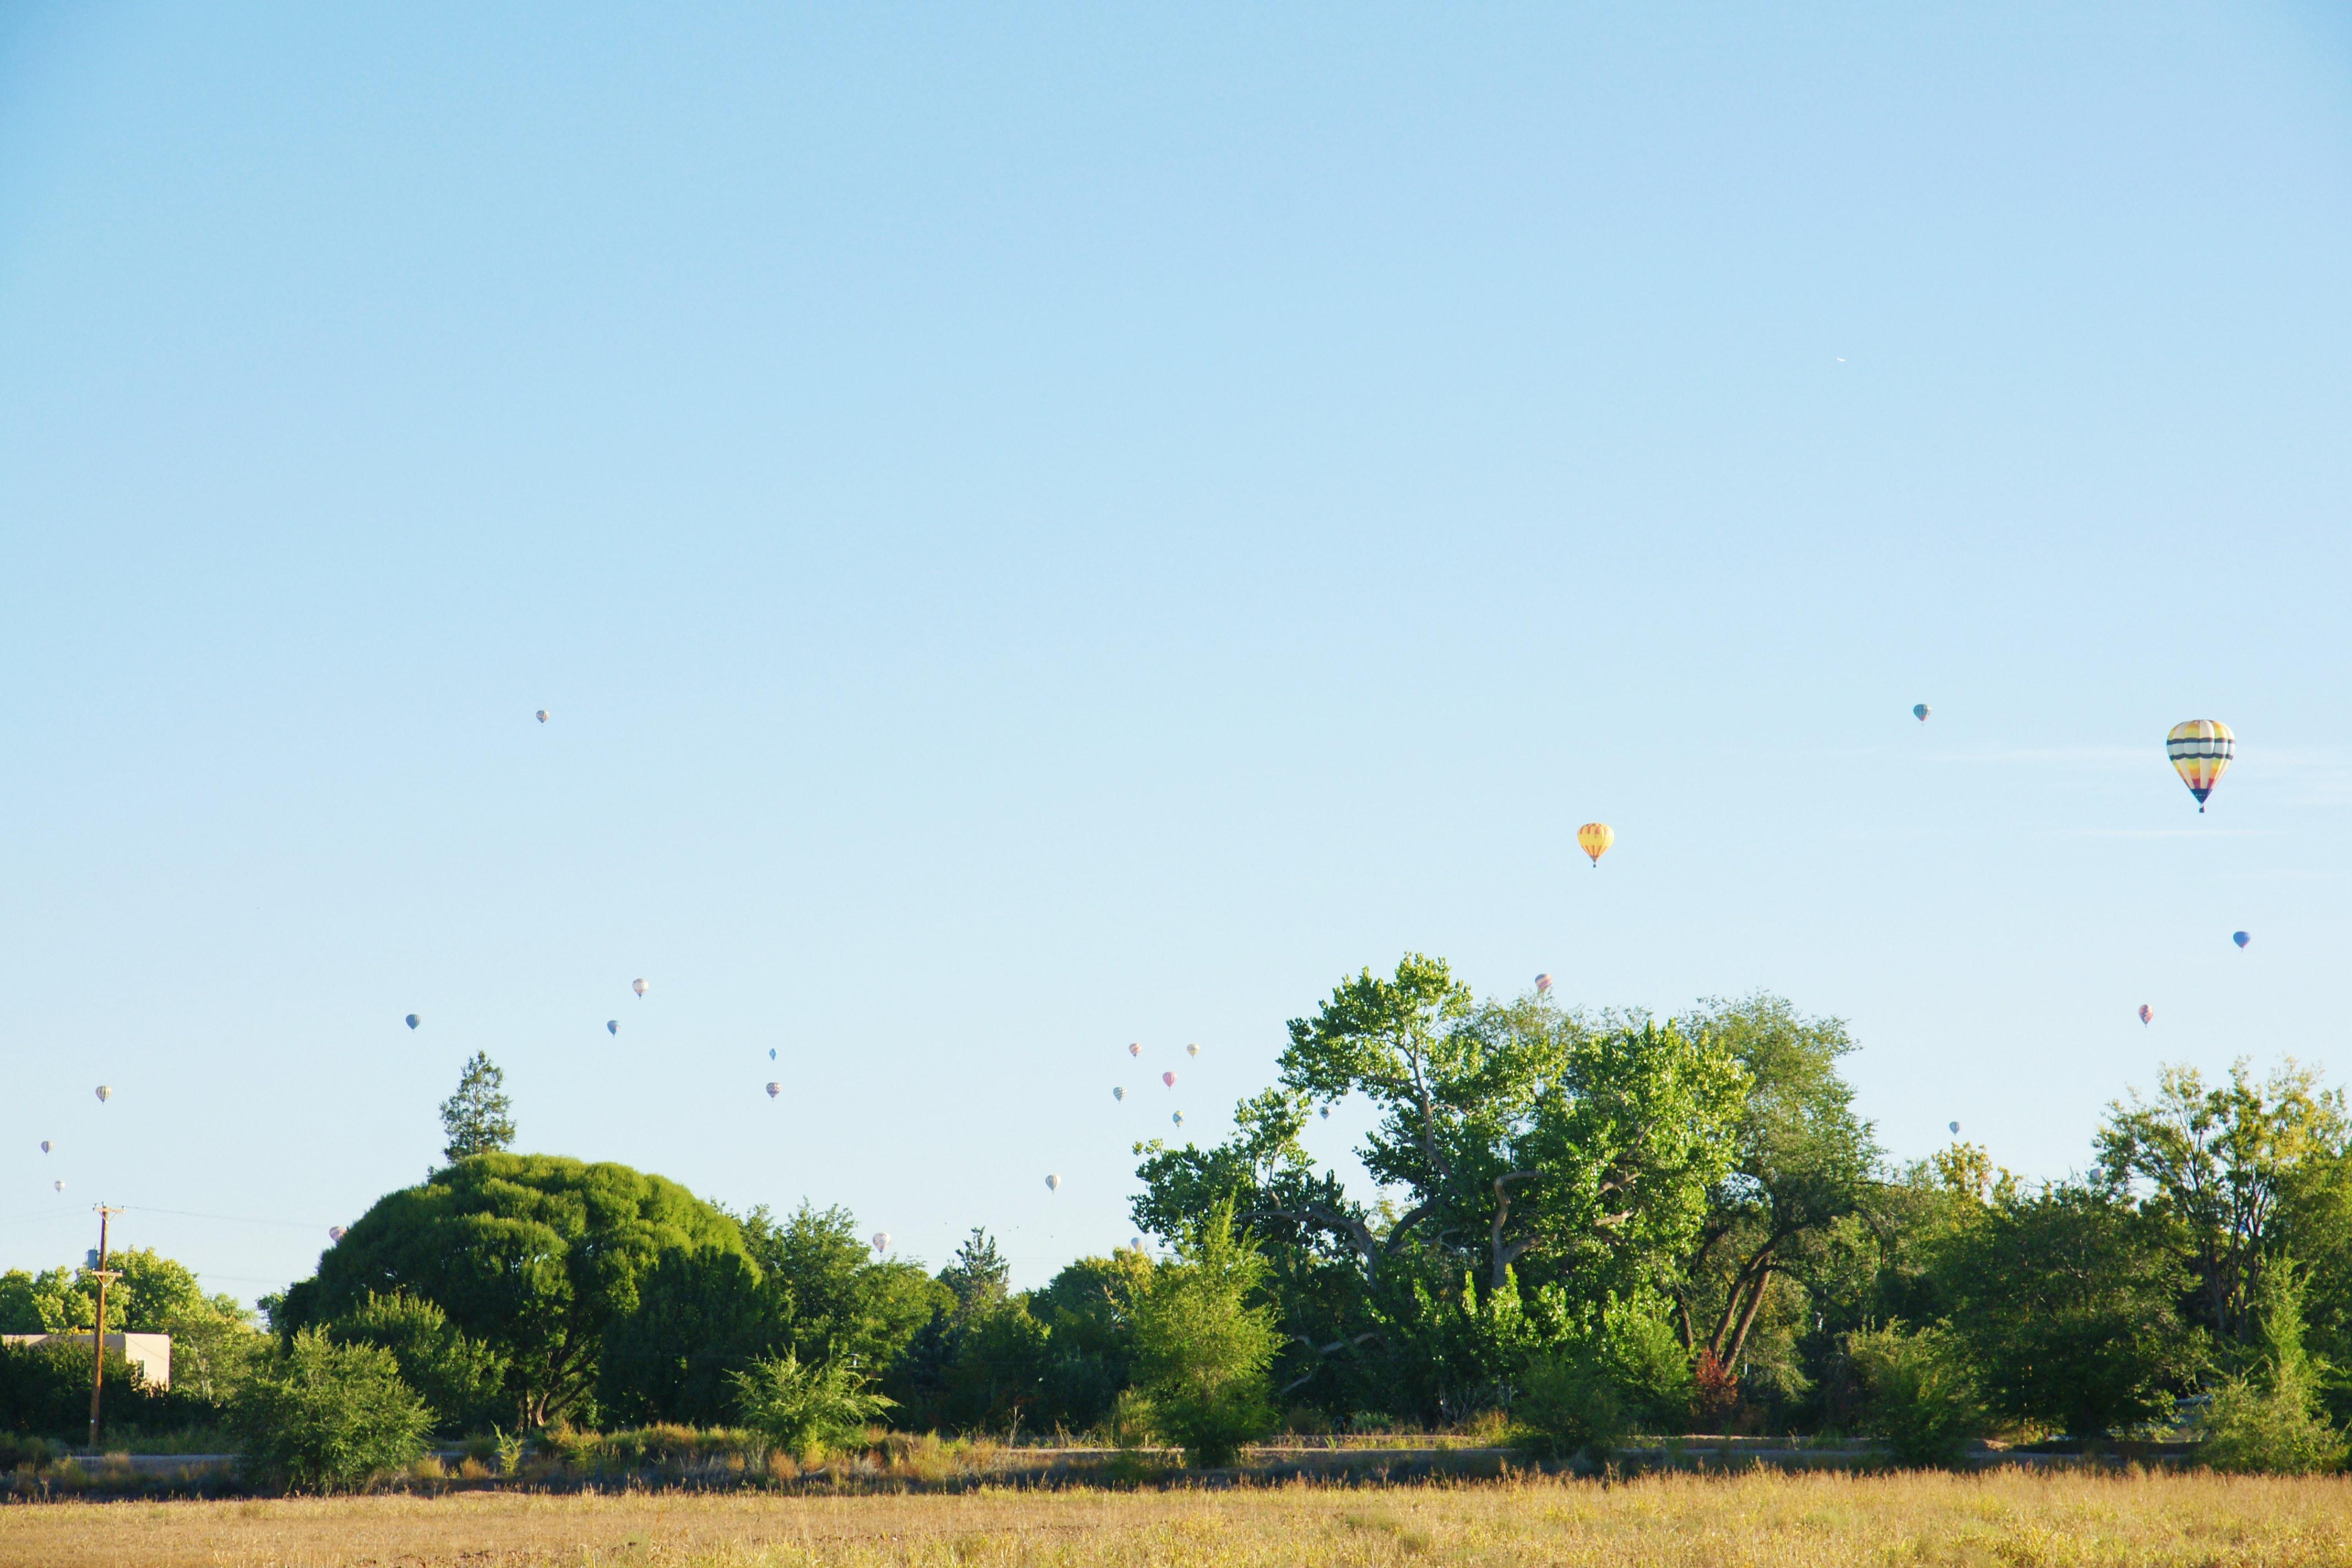 aibf-Balloon-Descent-Gallery05